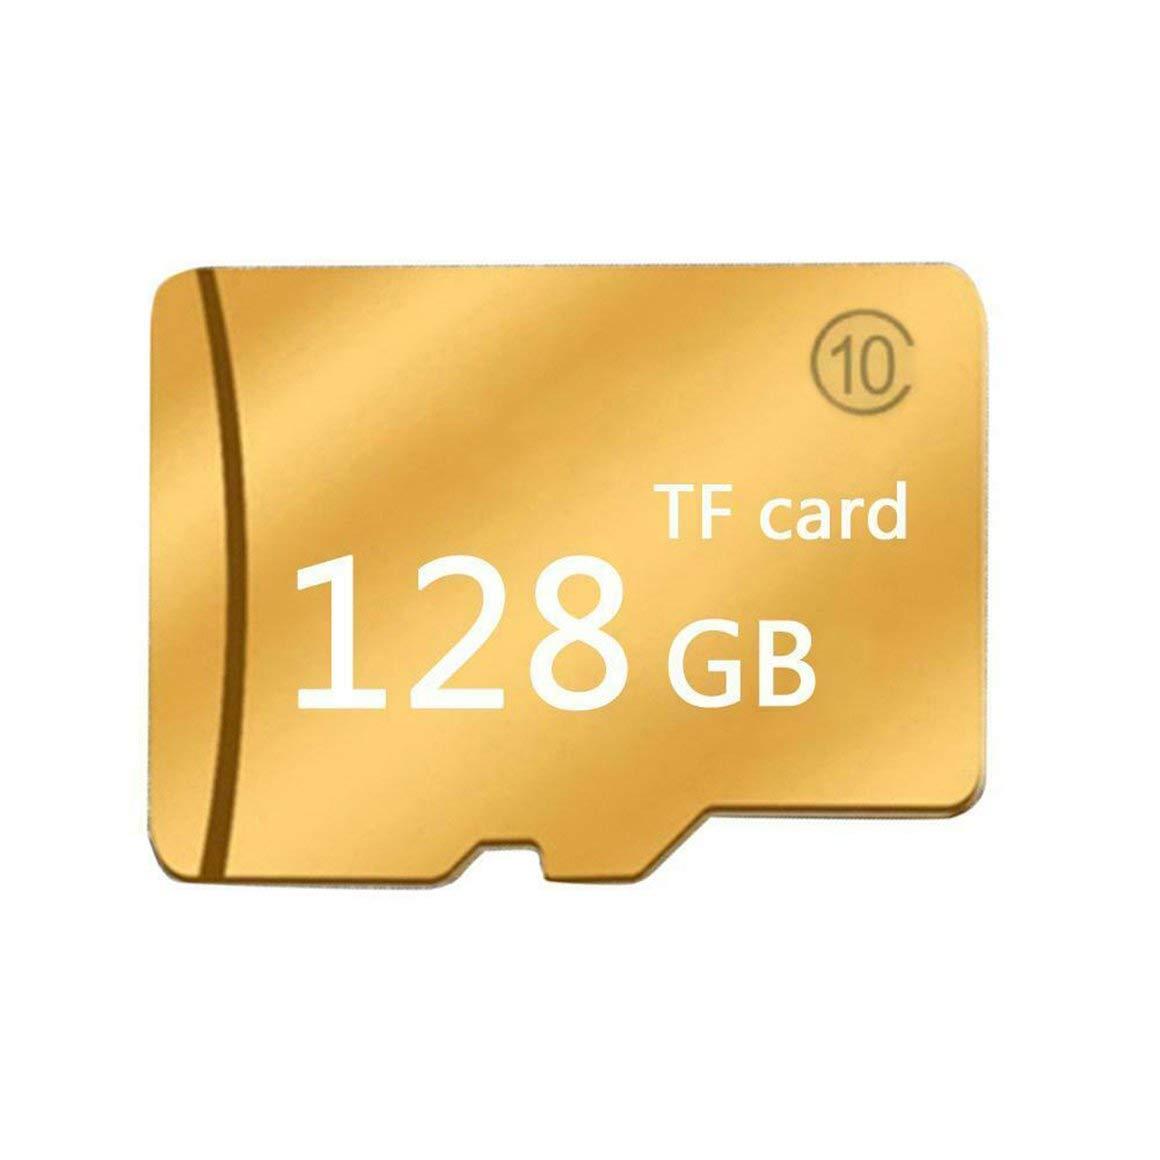 Paperllong/® Gold CRO-SD SD TF Tarjeta de Memoria Clase 10 Calidad Memoria Part/ículas Tarjeta de Memoria Gran Capacidad